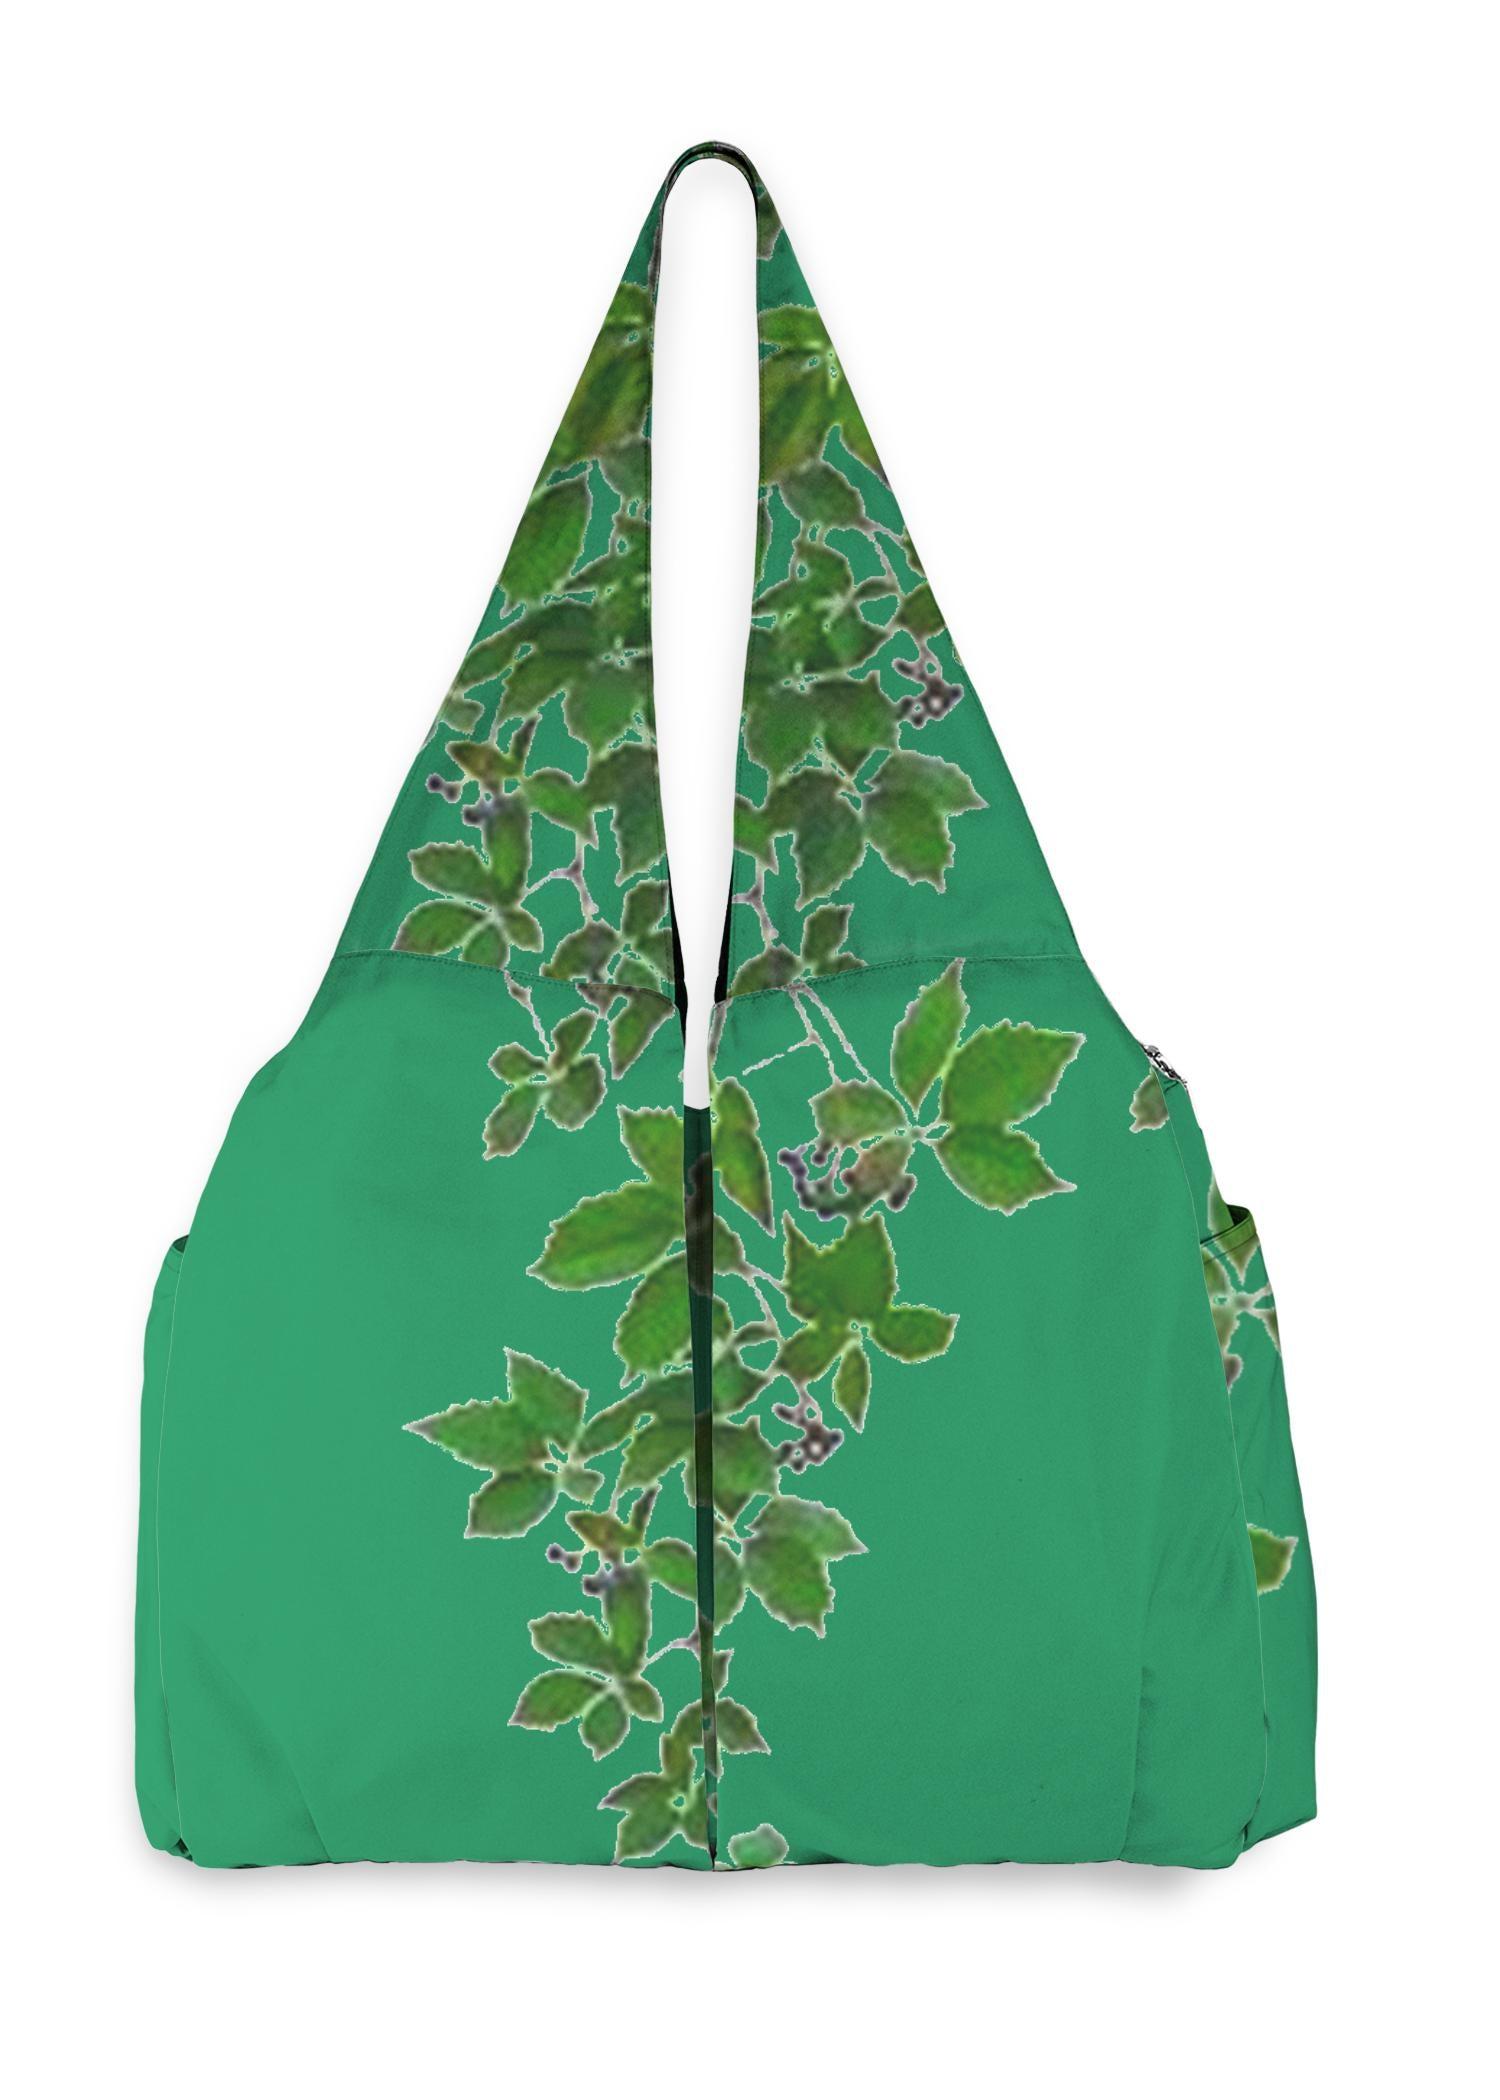 VIDA Studio Bag - Green Hanging Home Decor by VIDA Original Artist  - Size: One Size